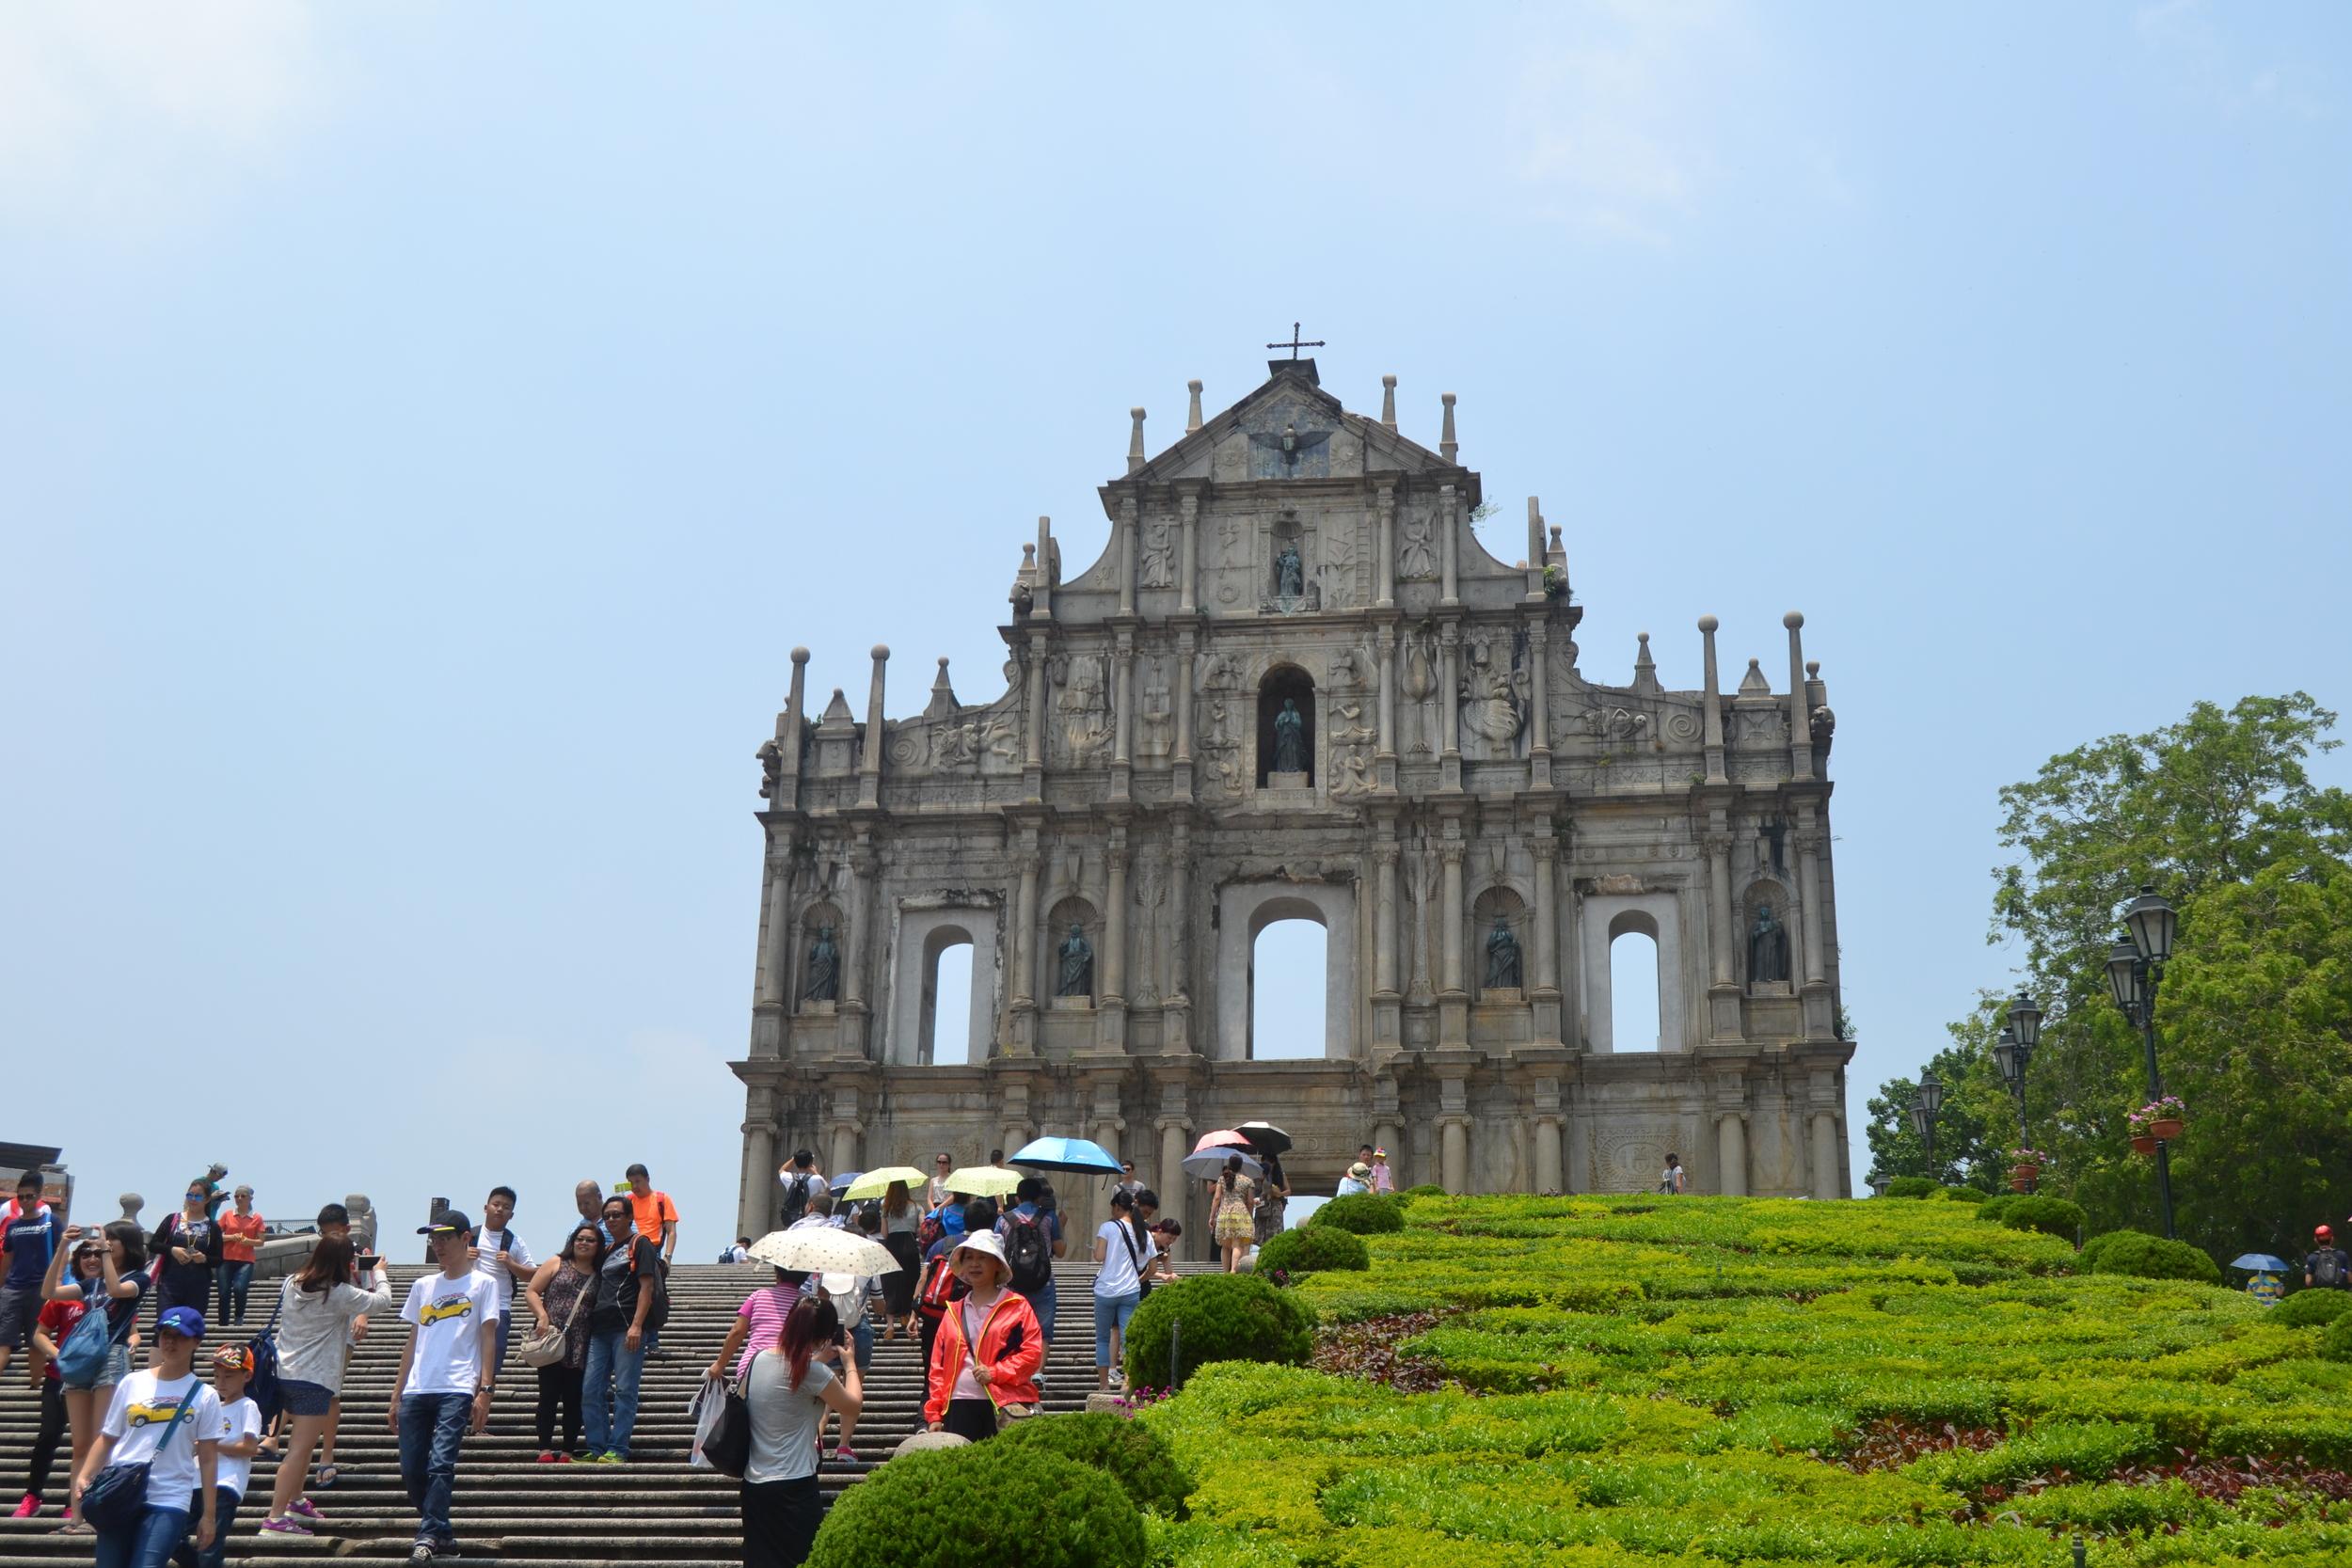 Ruins of St. Paul,Macau